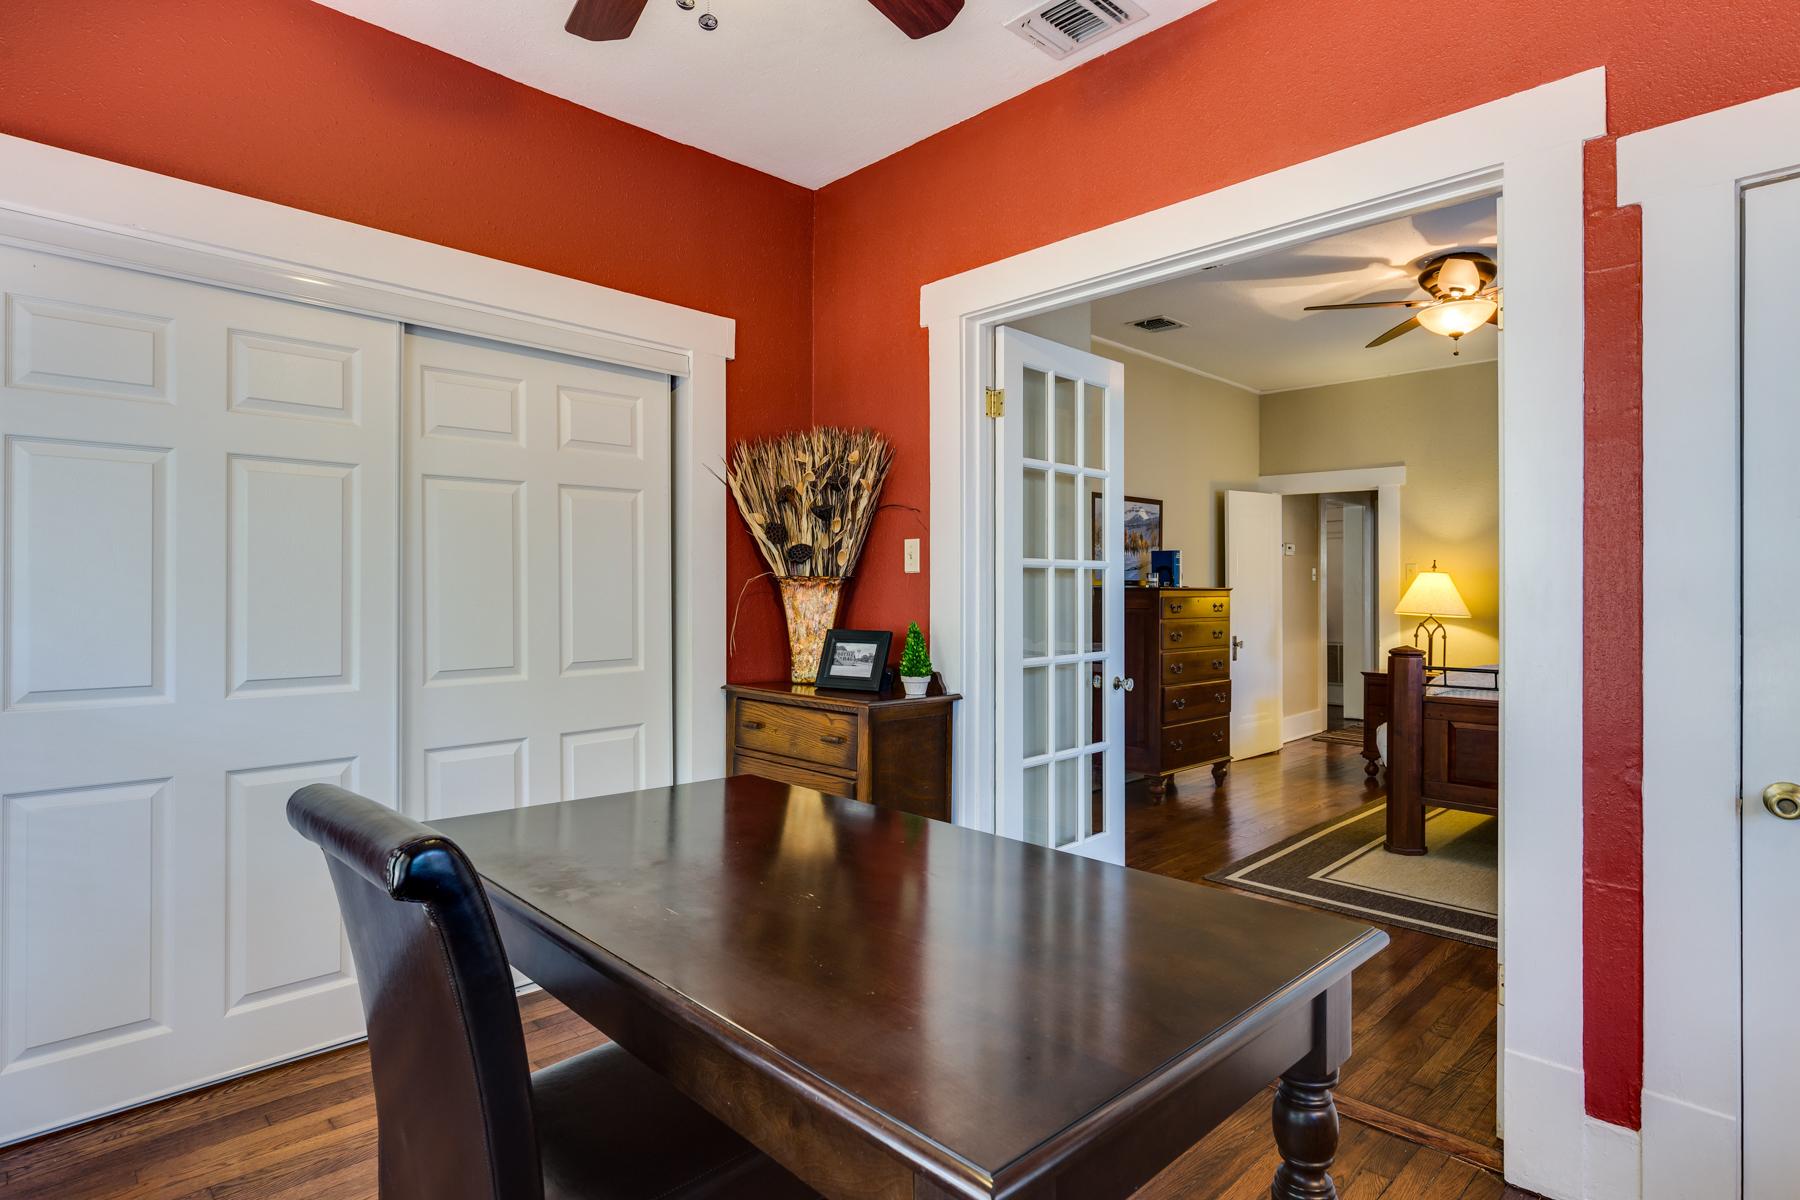 Additional photo for property listing at Urban Bungalow in Mahncke Park 346 Thorman Pl San Antonio, Texas 78209 Estados Unidos